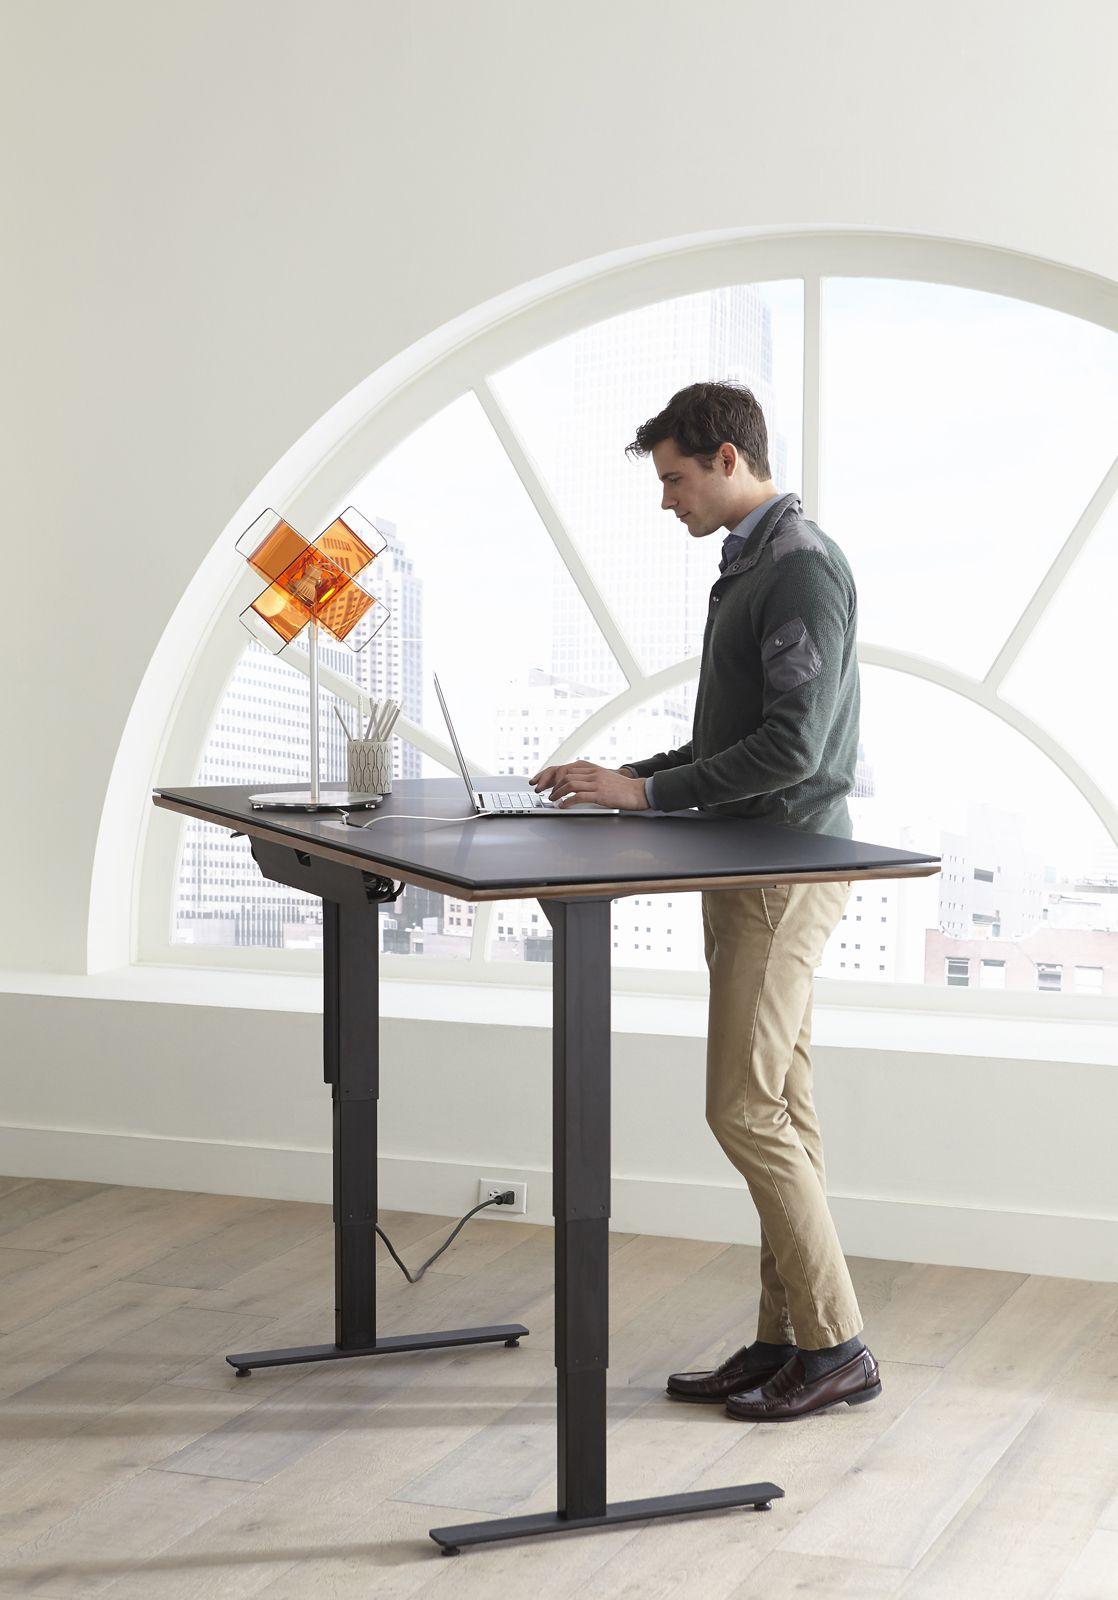 Sequel Lift Desk In 2020 Lift Desk Office Furniture Modern Desk